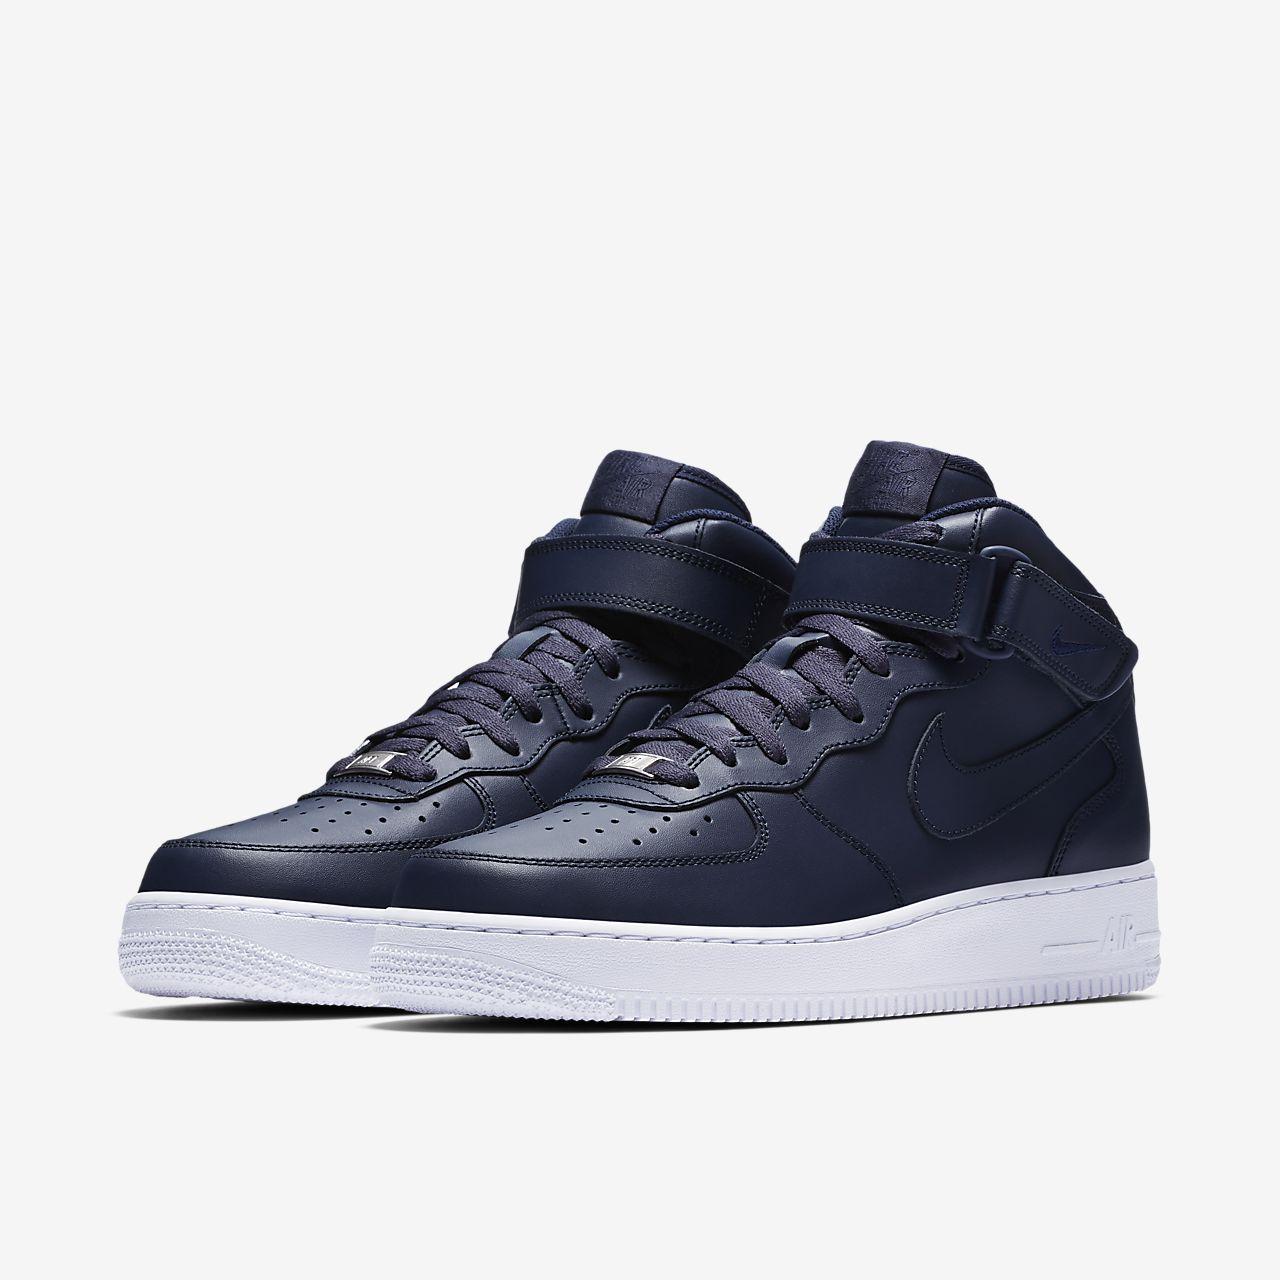 Pánske tenisky Nike Air Force 1 Mid `07 Obsidian White - Glami.sk 28ae389291